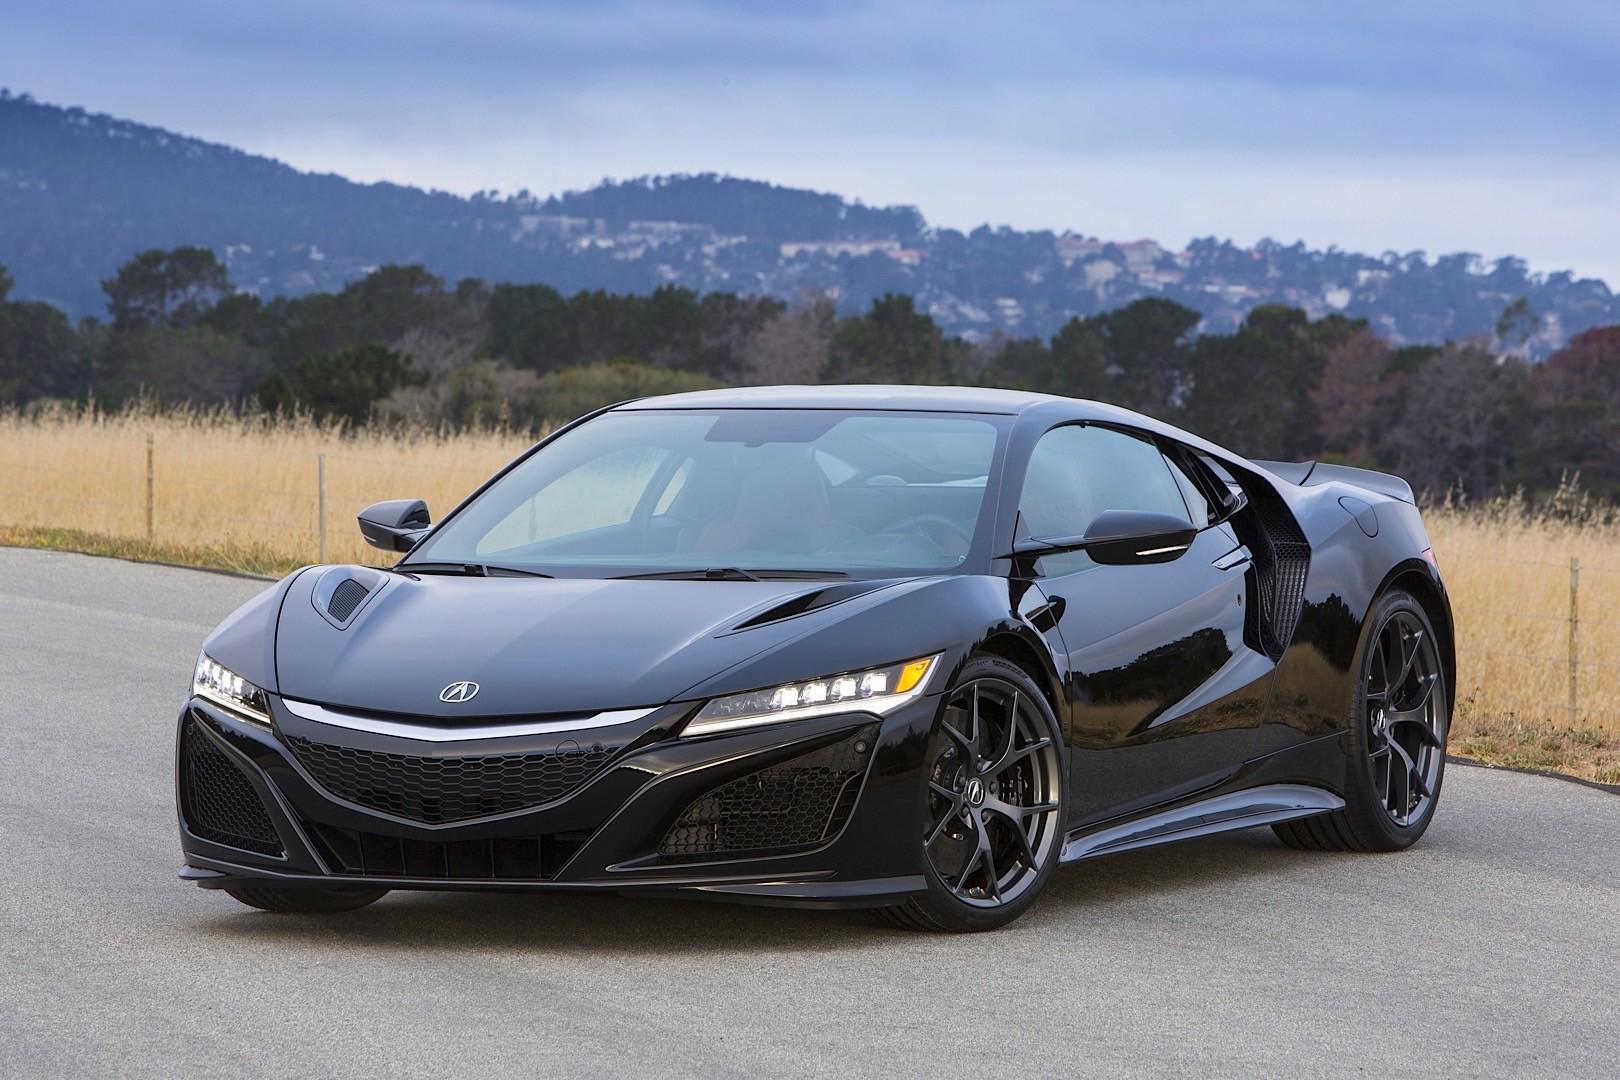 Acura Car Gallery | 2016 Car Release Date